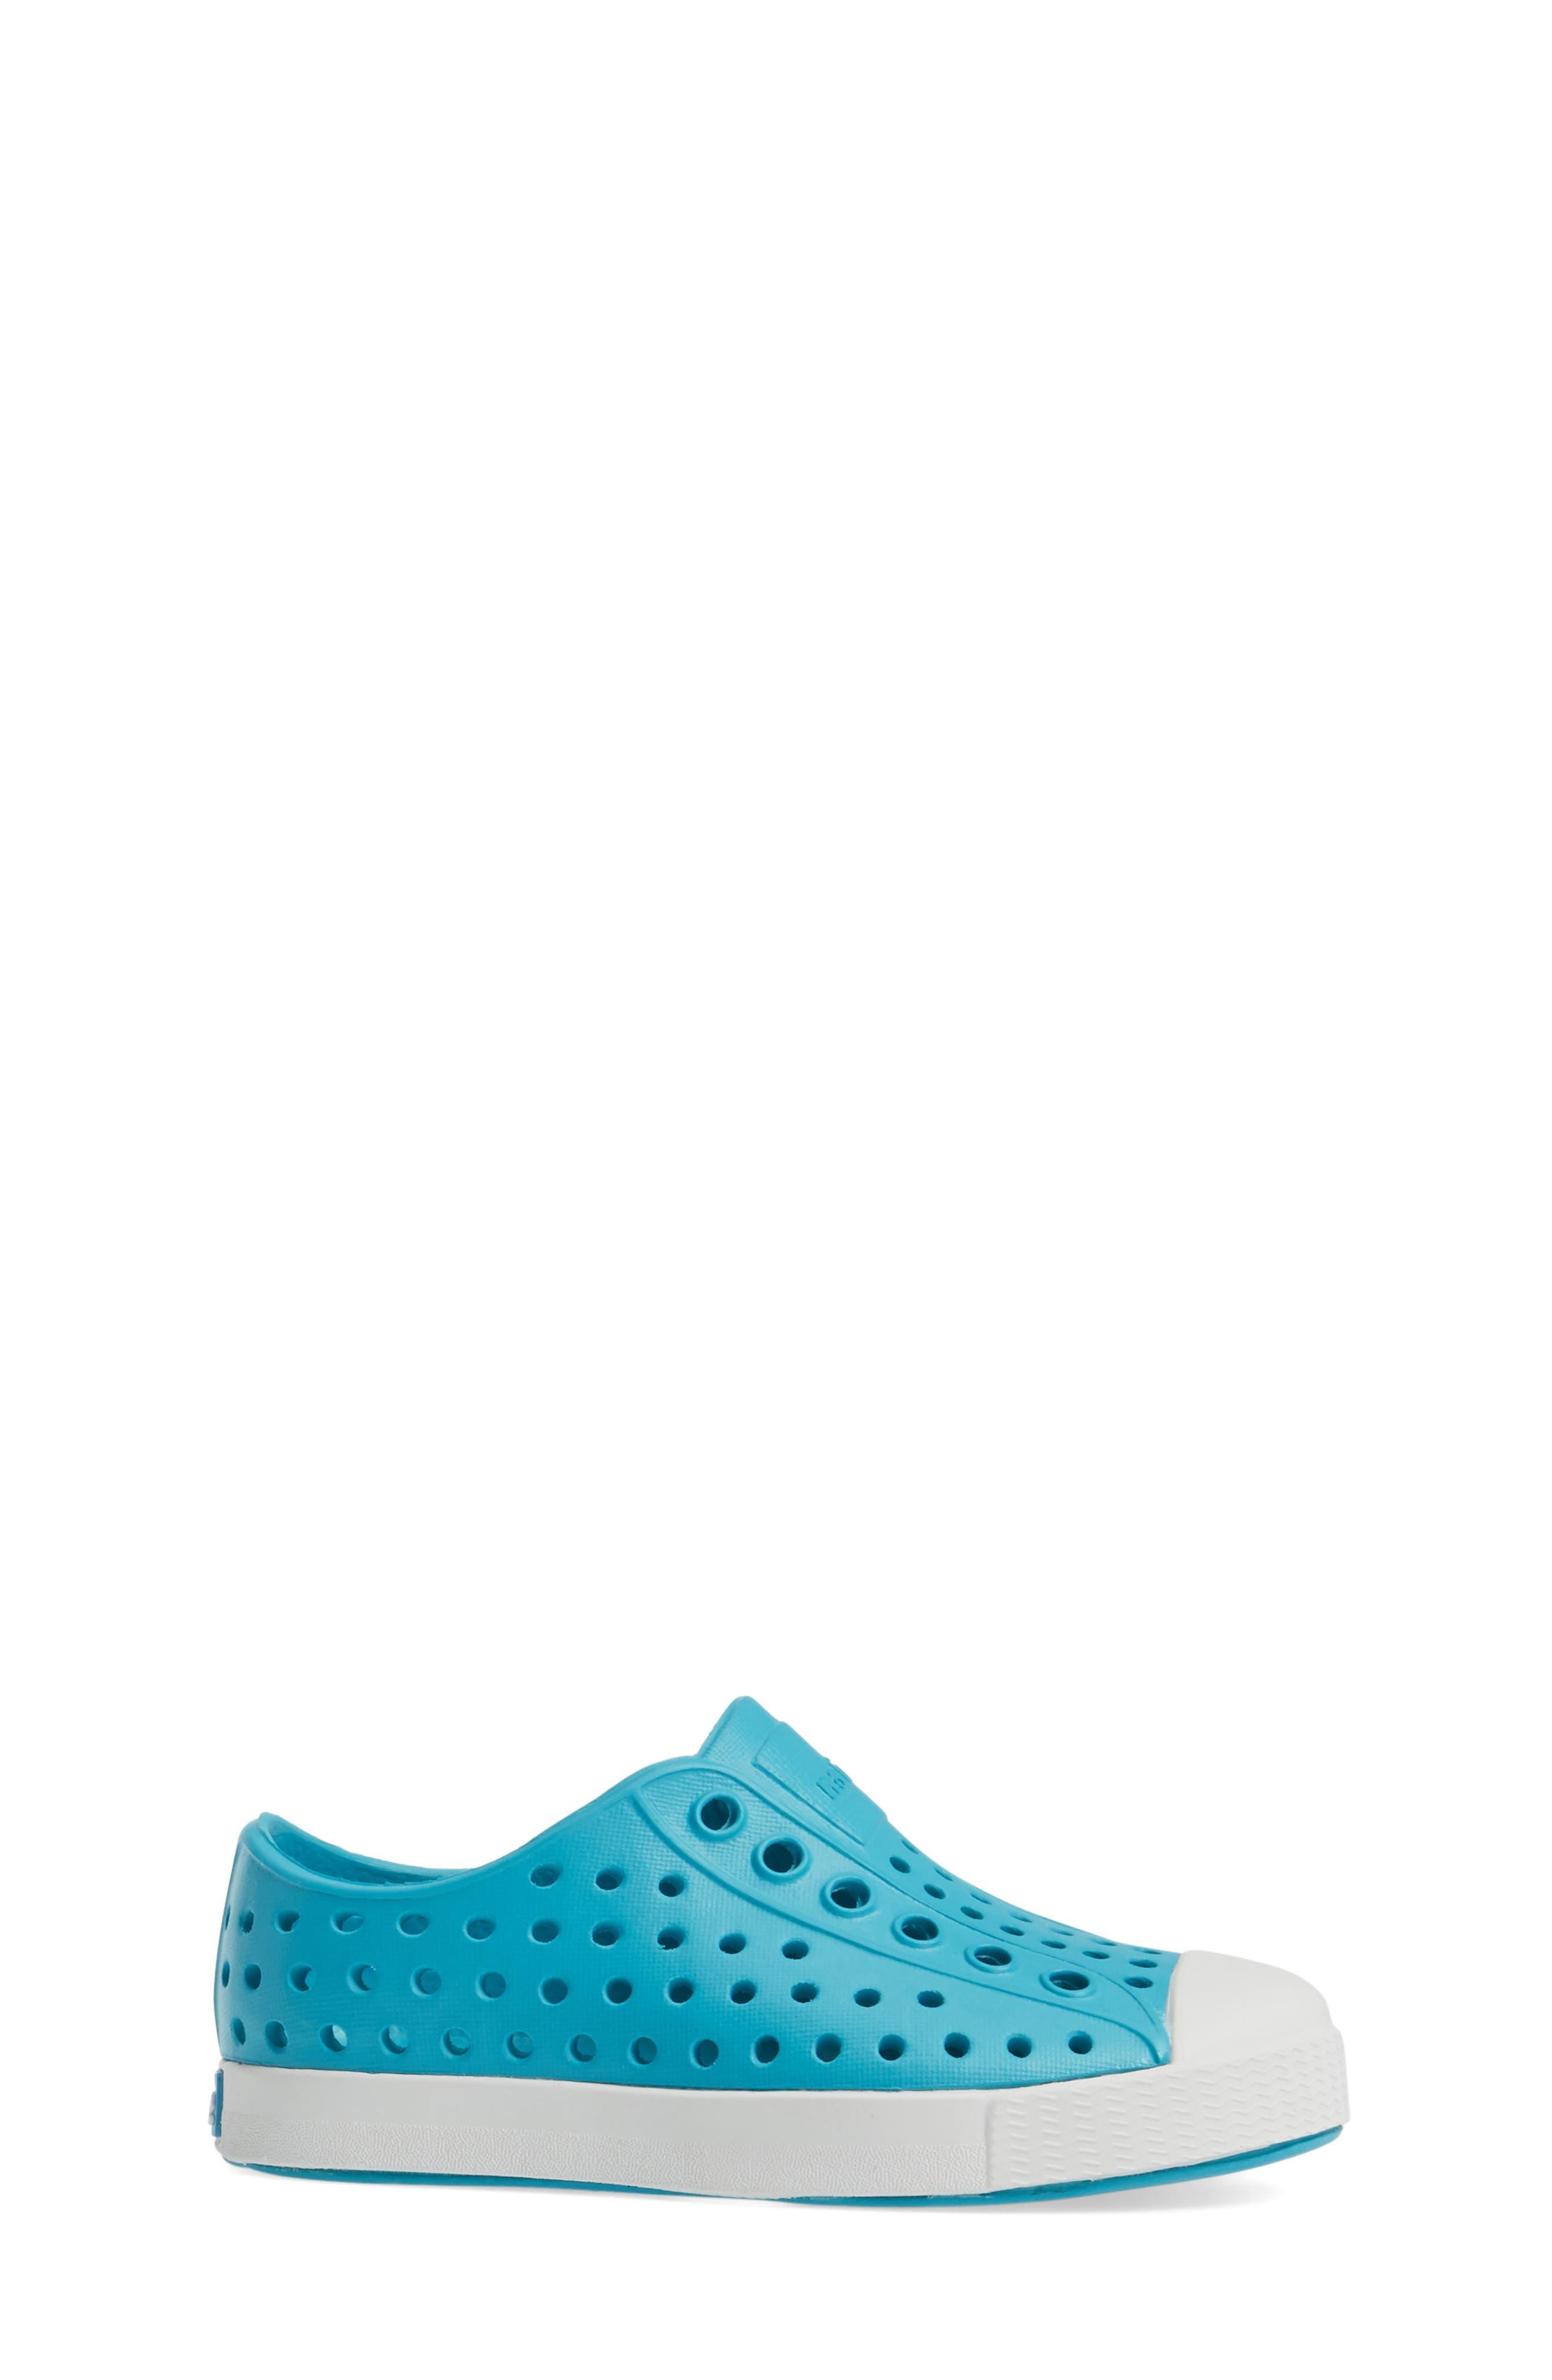 'Jefferson' Water Friendly Slip-On Sneaker,                             Alternate thumbnail 145, color,